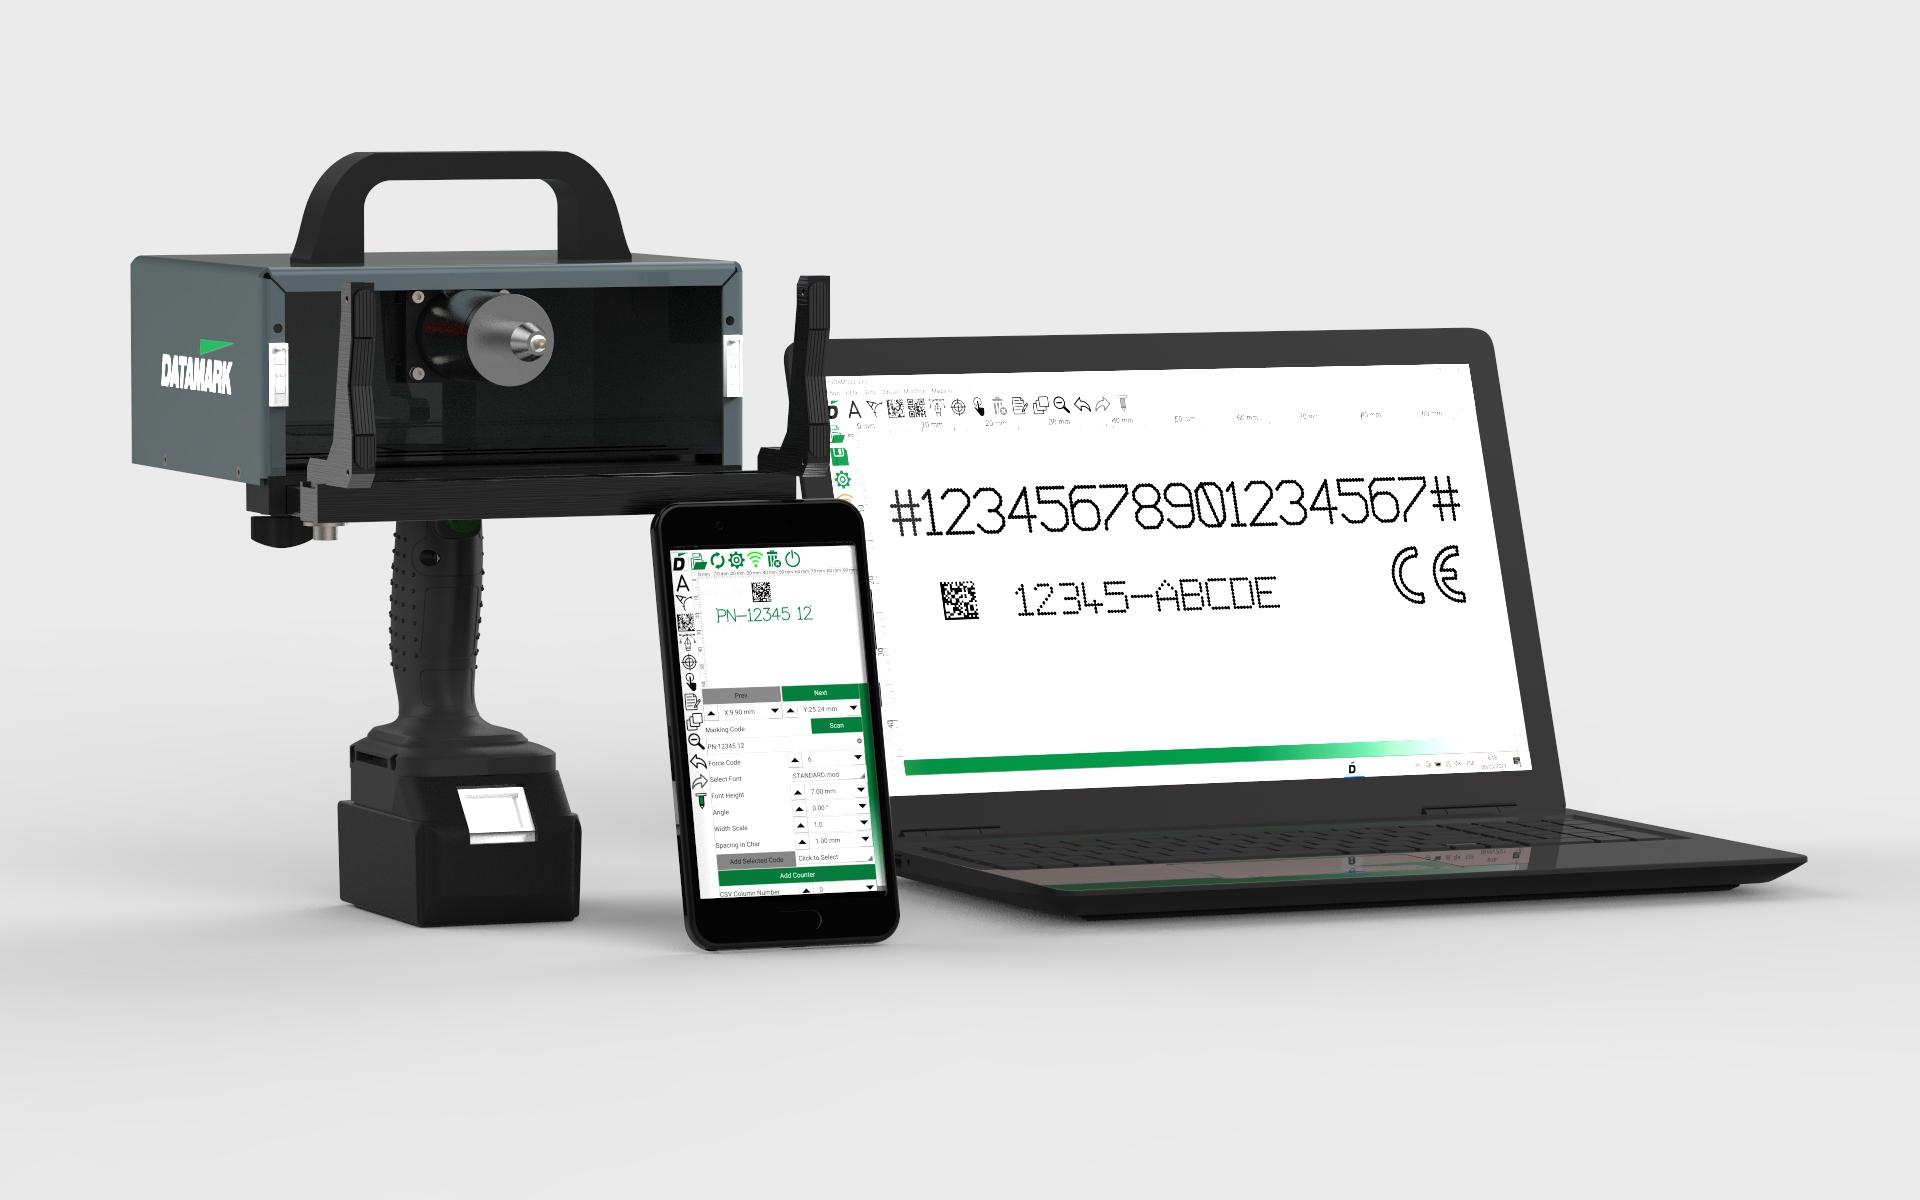 Marcadora de metal portátil Datamark MP-150